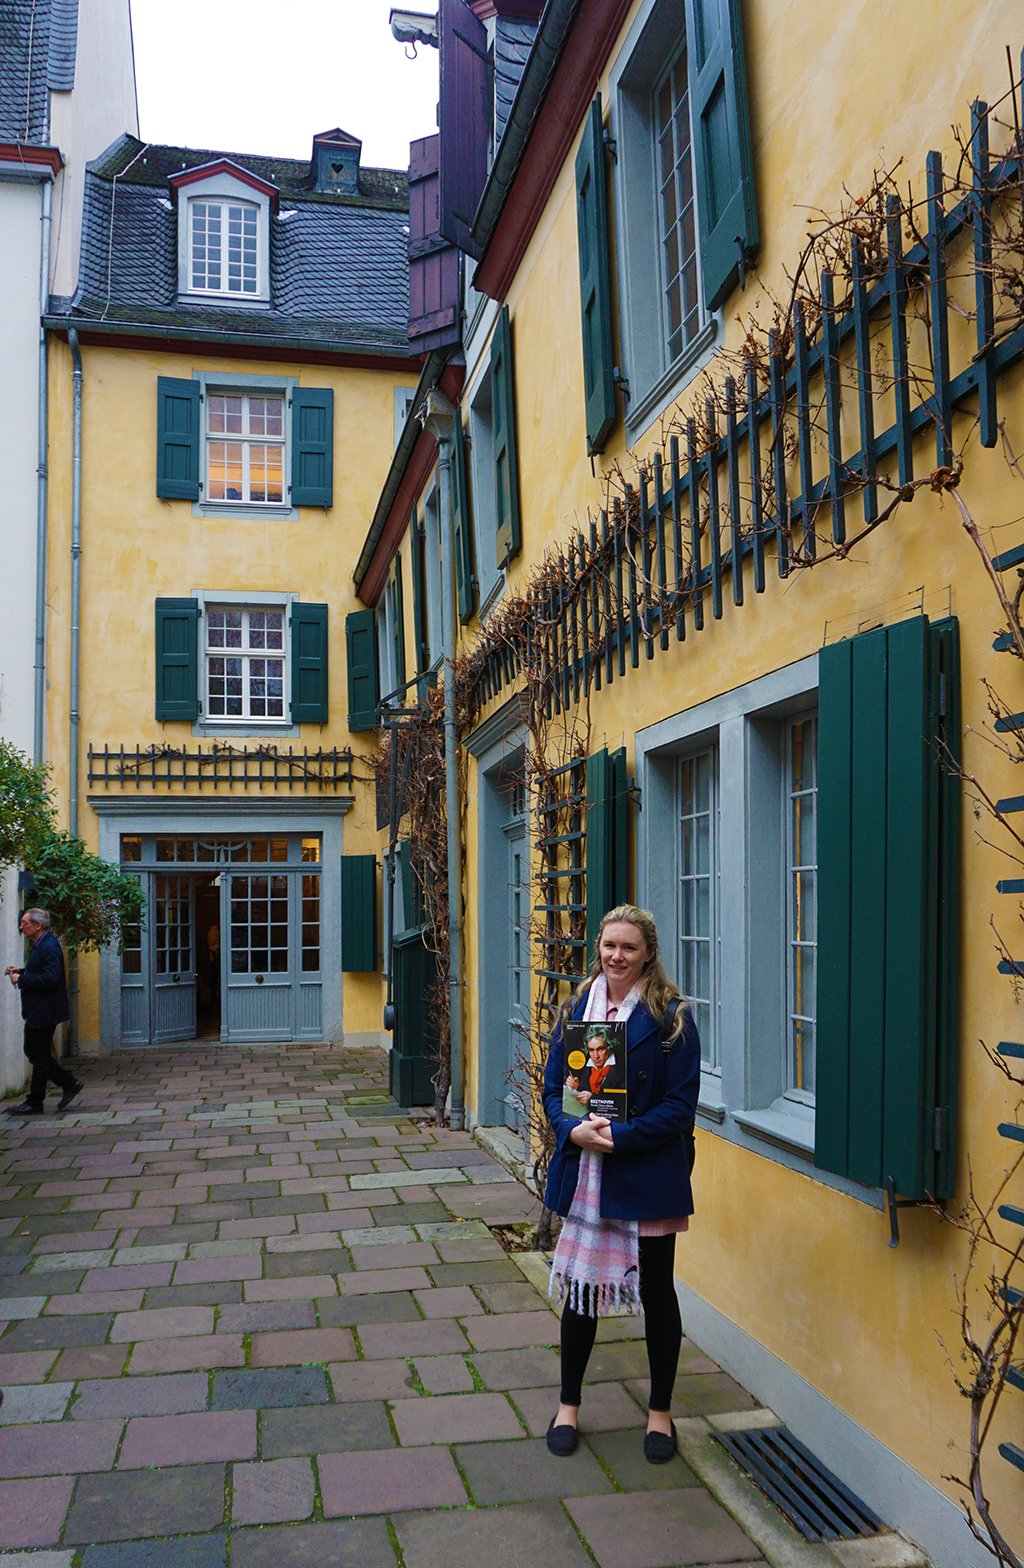 bonn-germany-beethoven-2020-bthvn-2020-malorie-mackey-travel-adventure